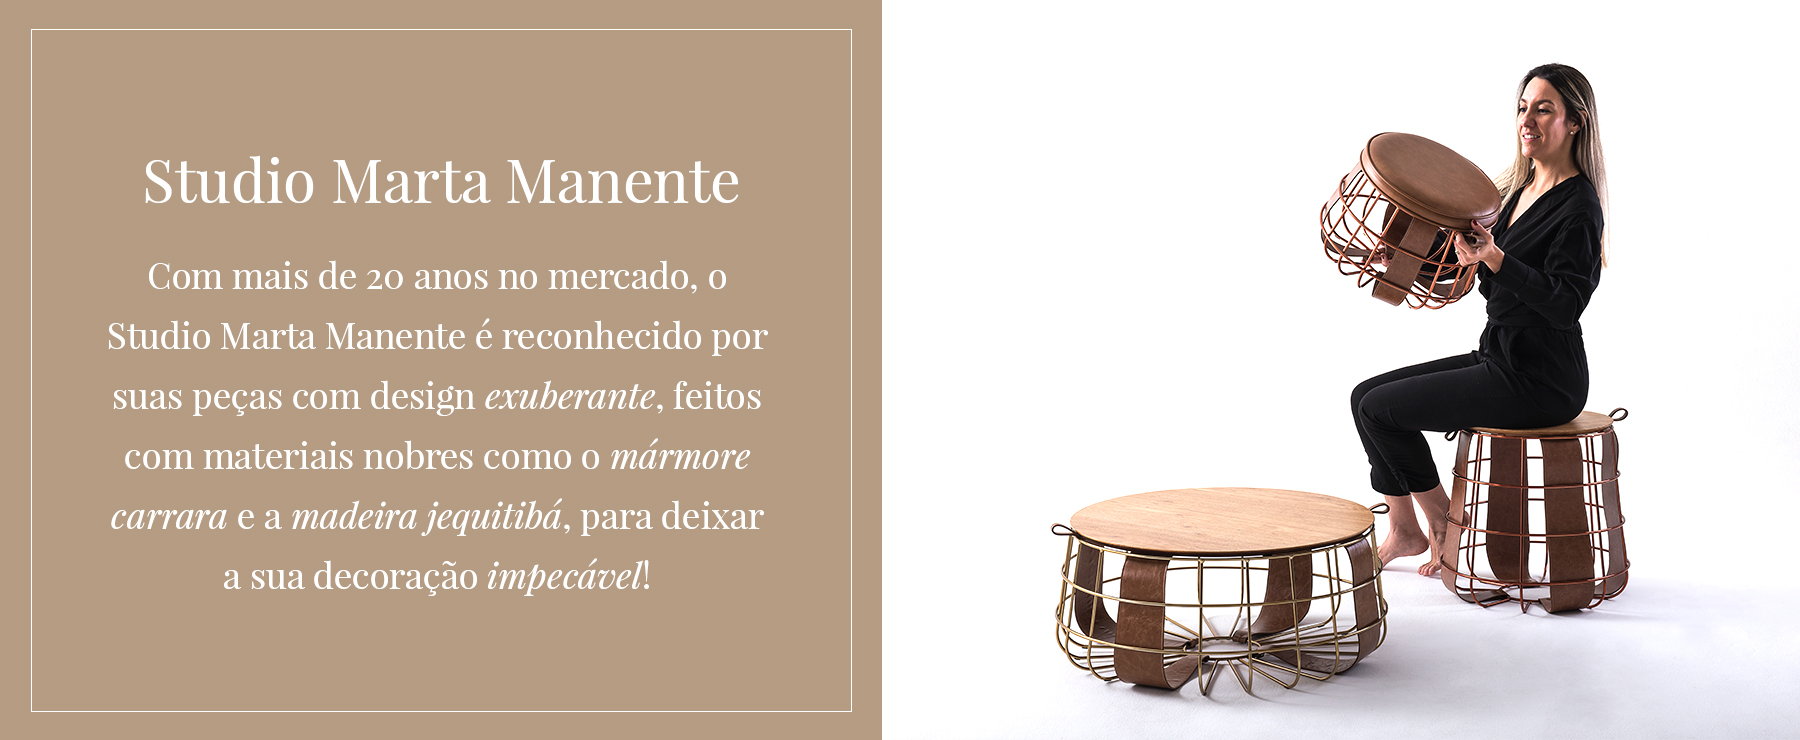 Studio Marta Manente | WestwingNow